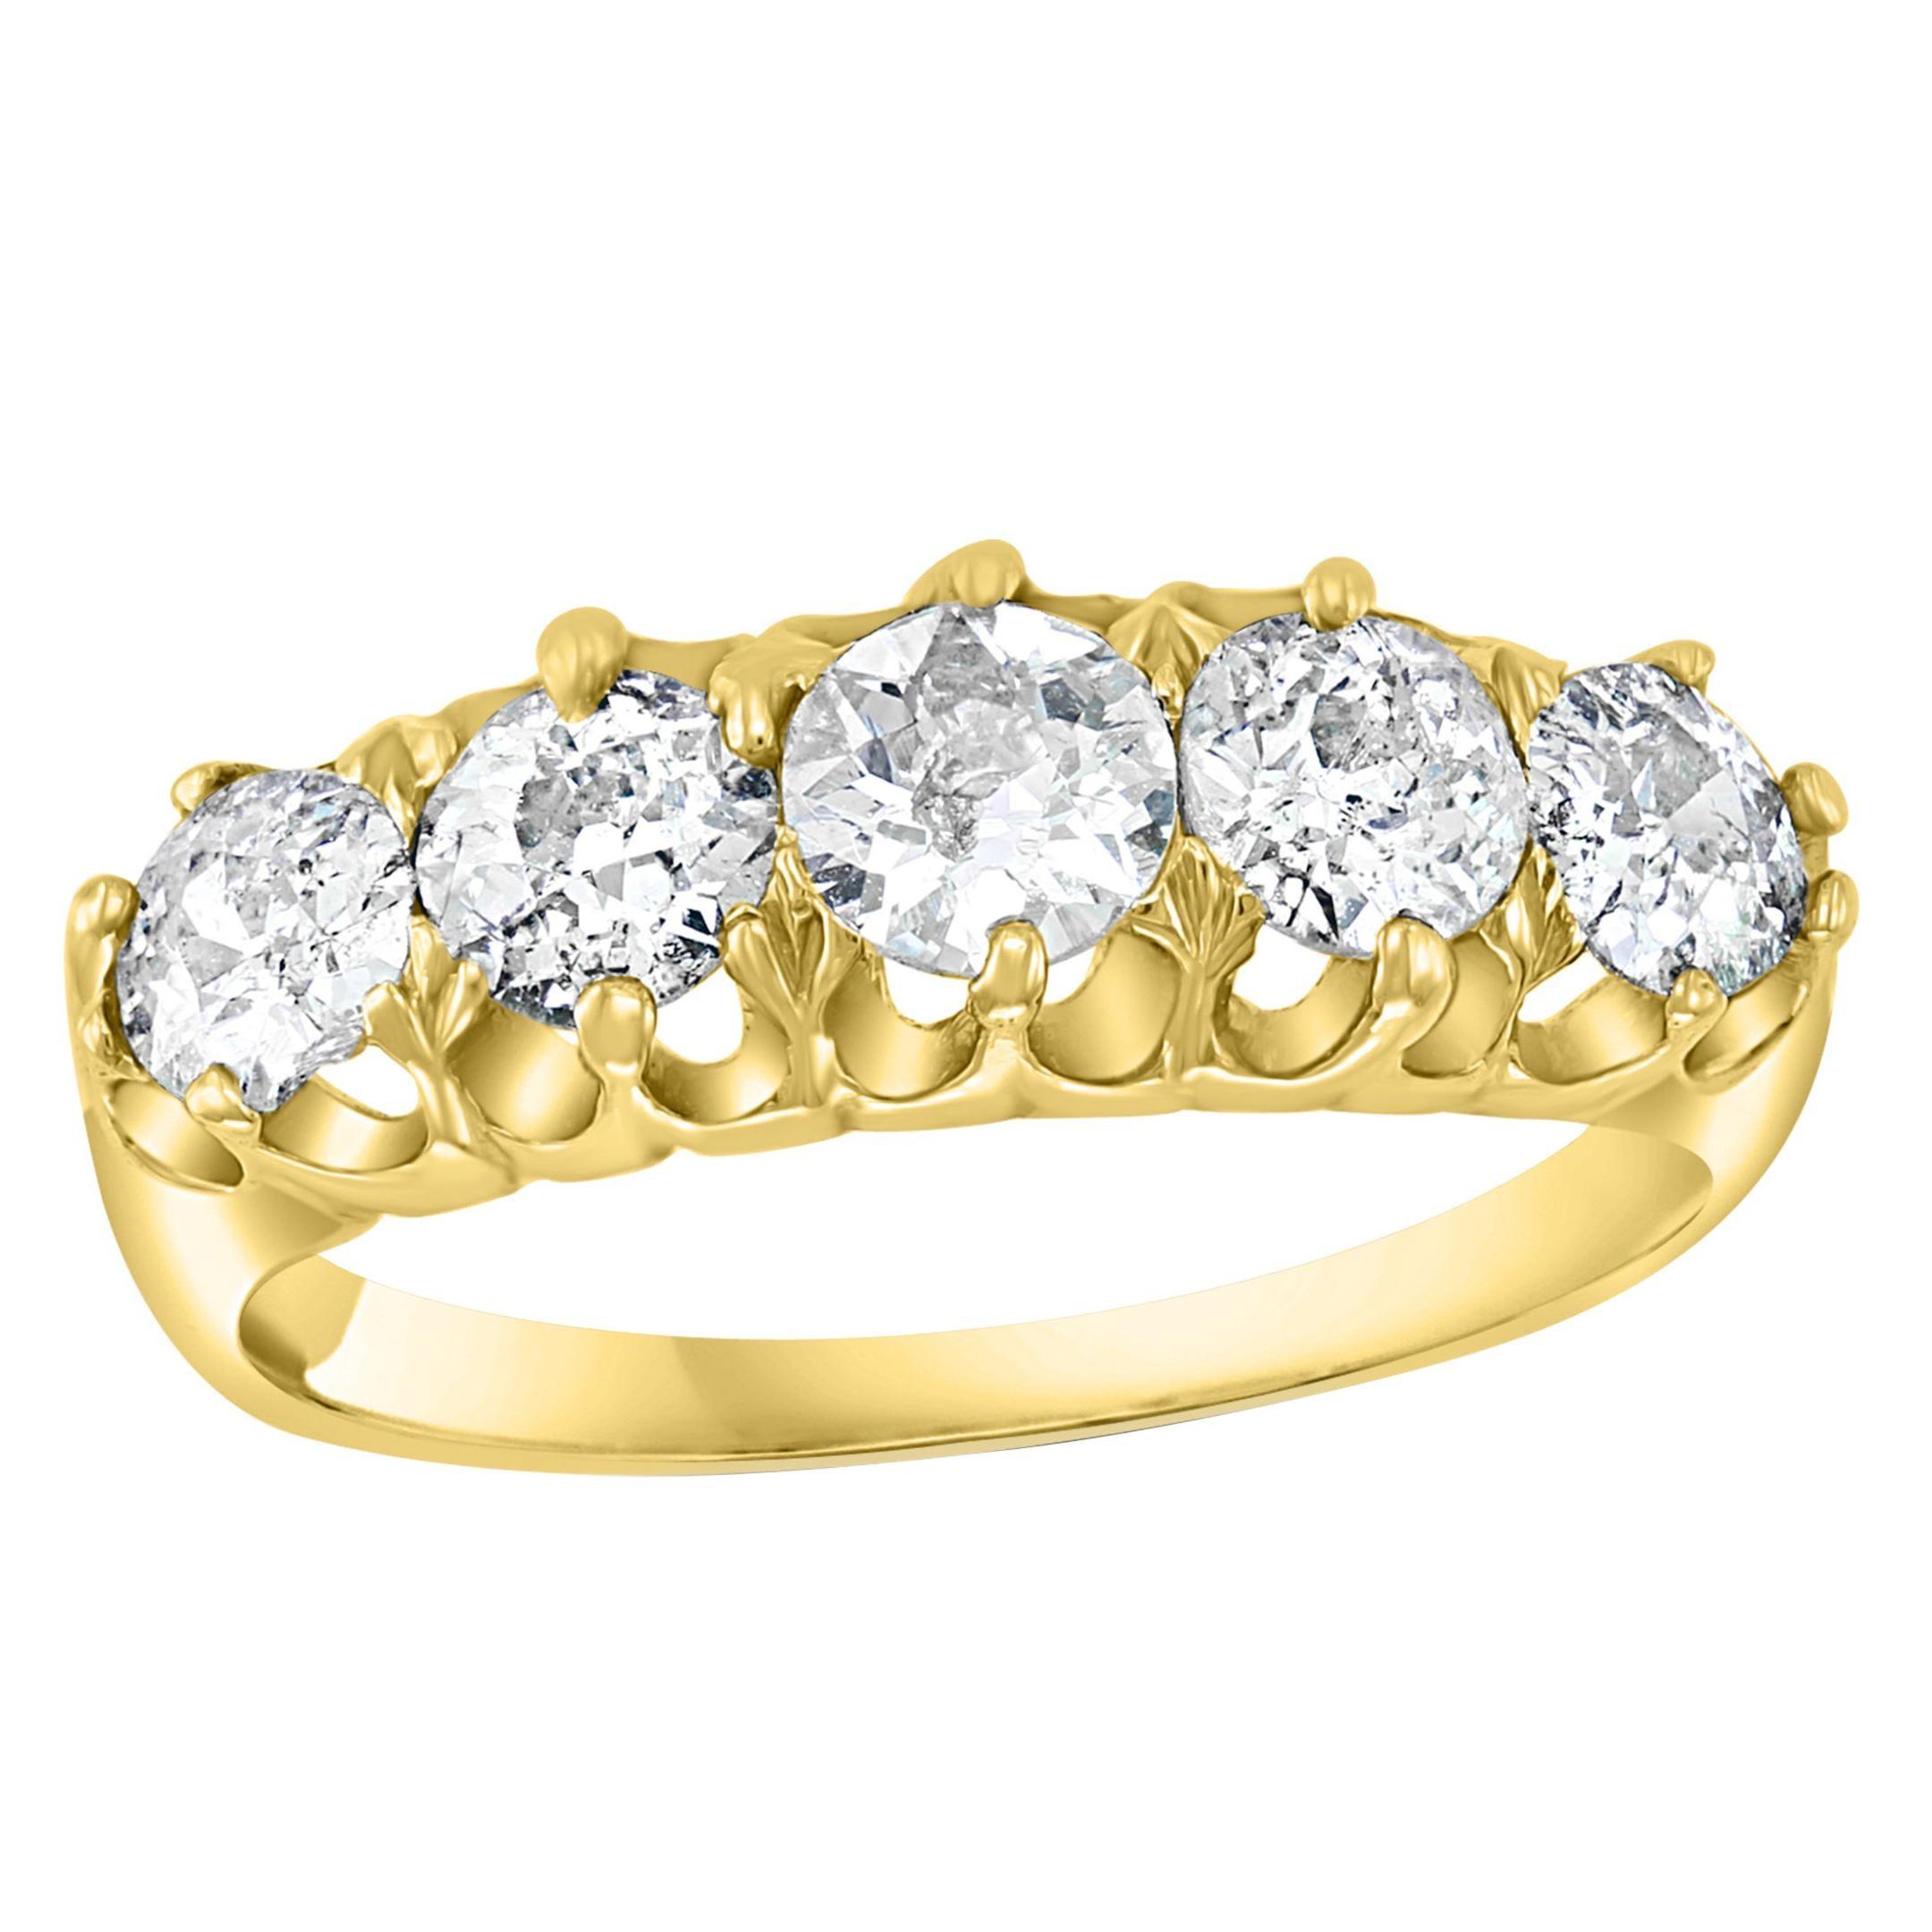 5 Diamonds, Unisex 1-Row Diamond Band Ring in 14 Karat Yellow Gold